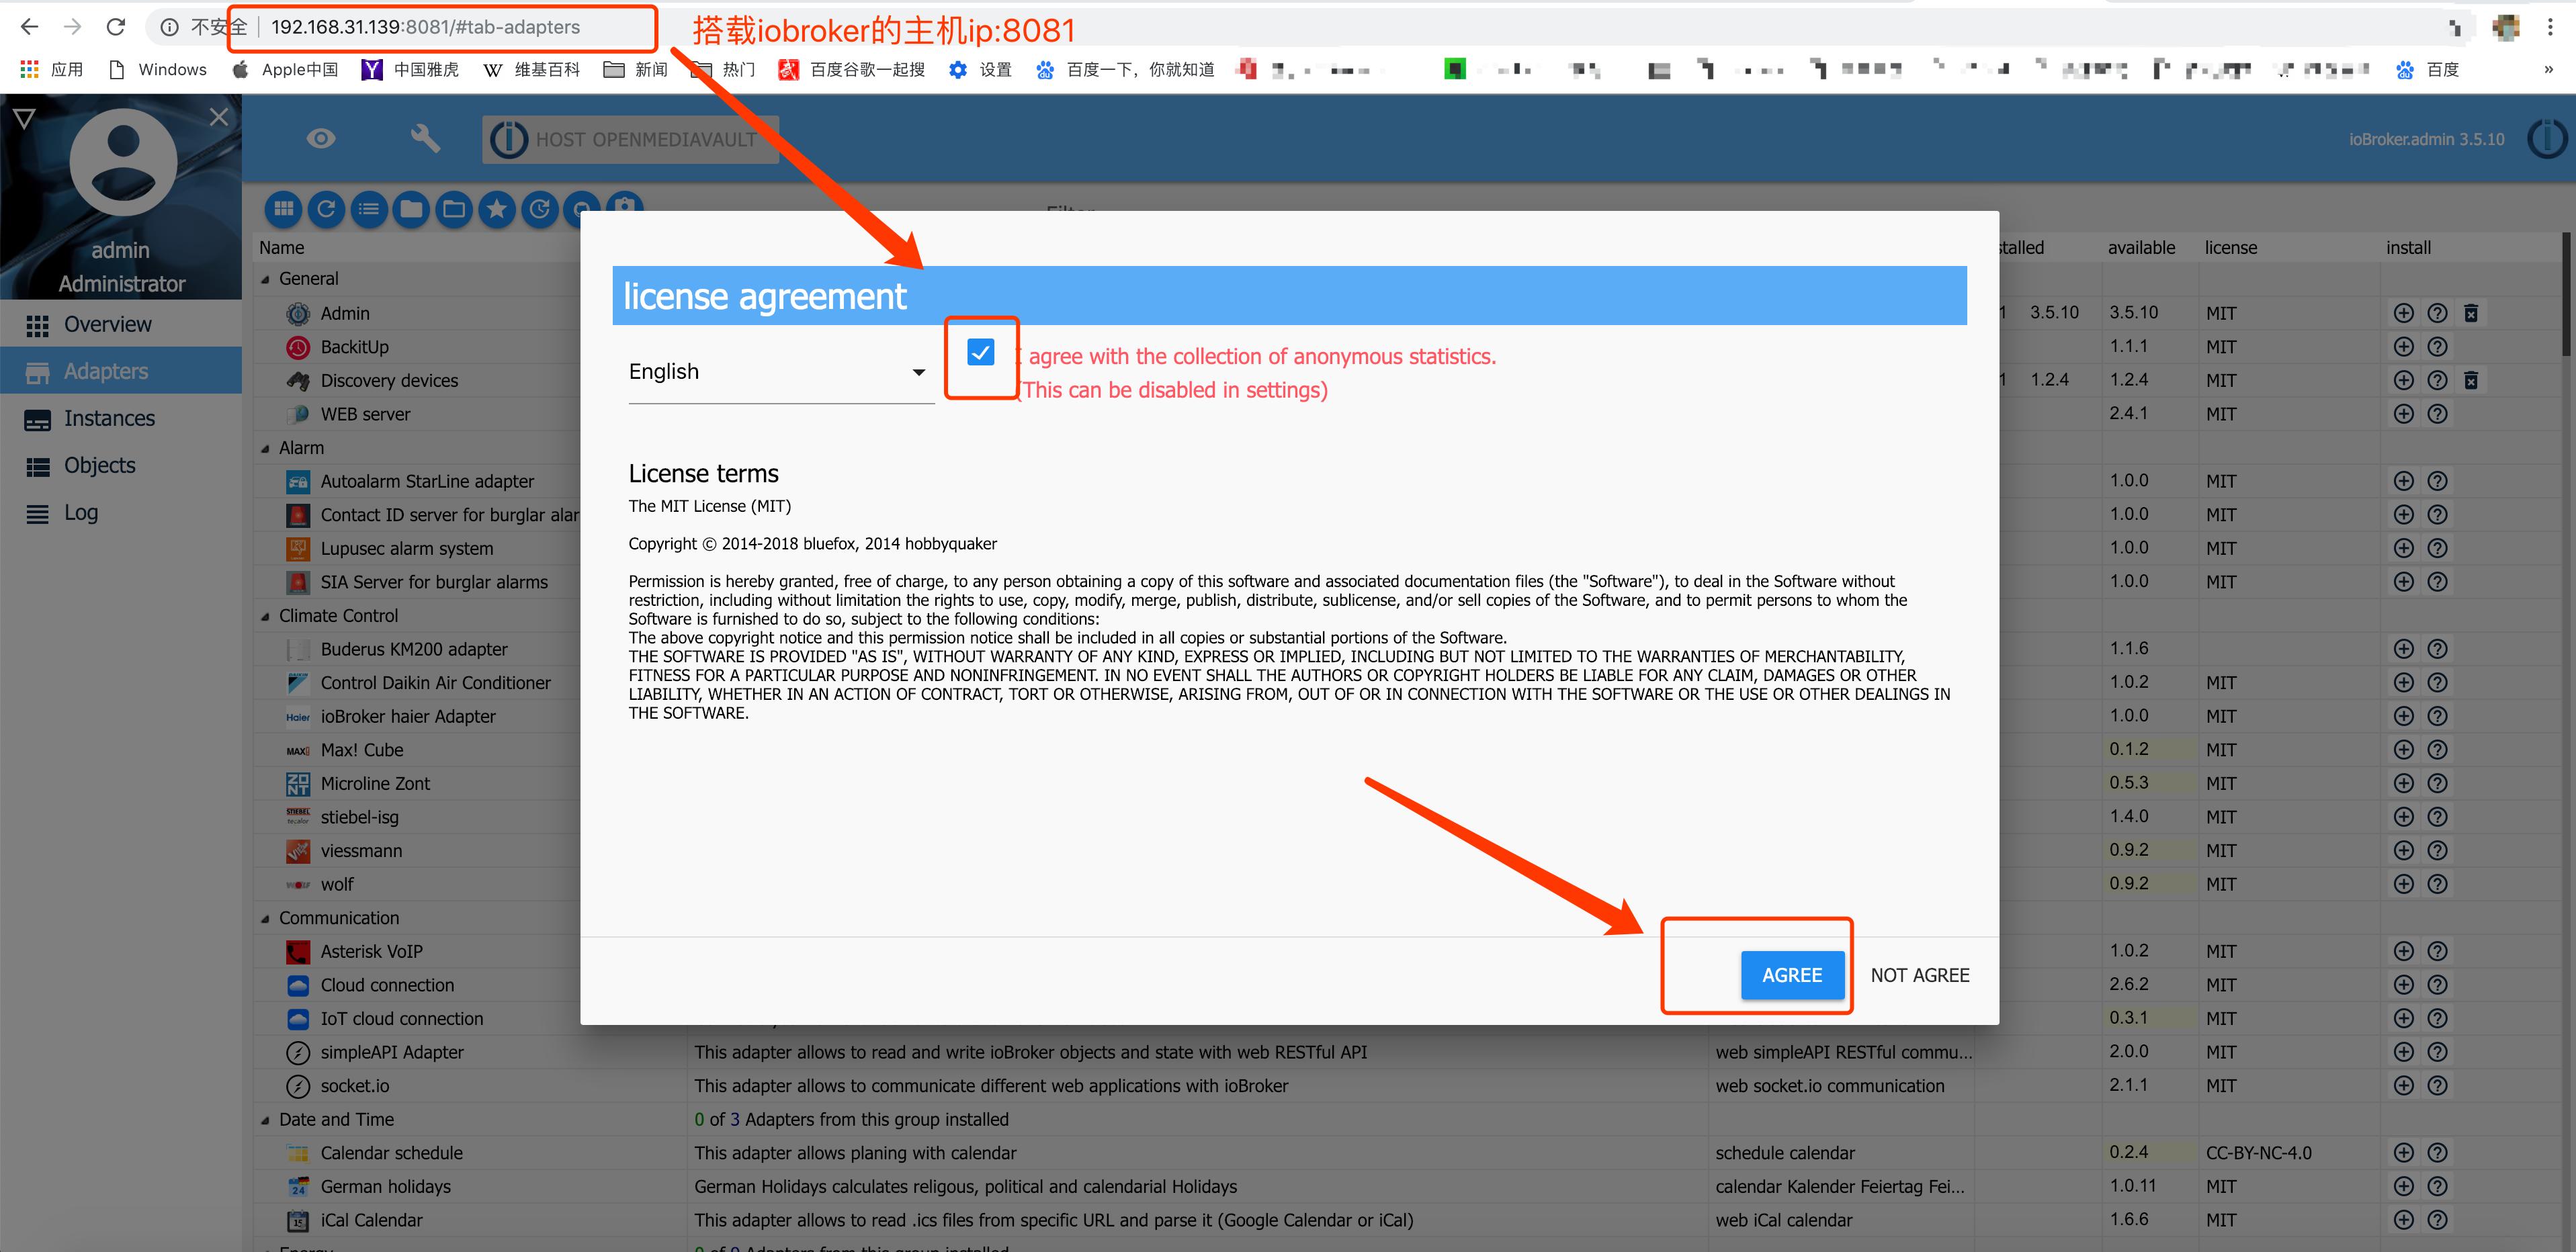 登录首页及选项.png